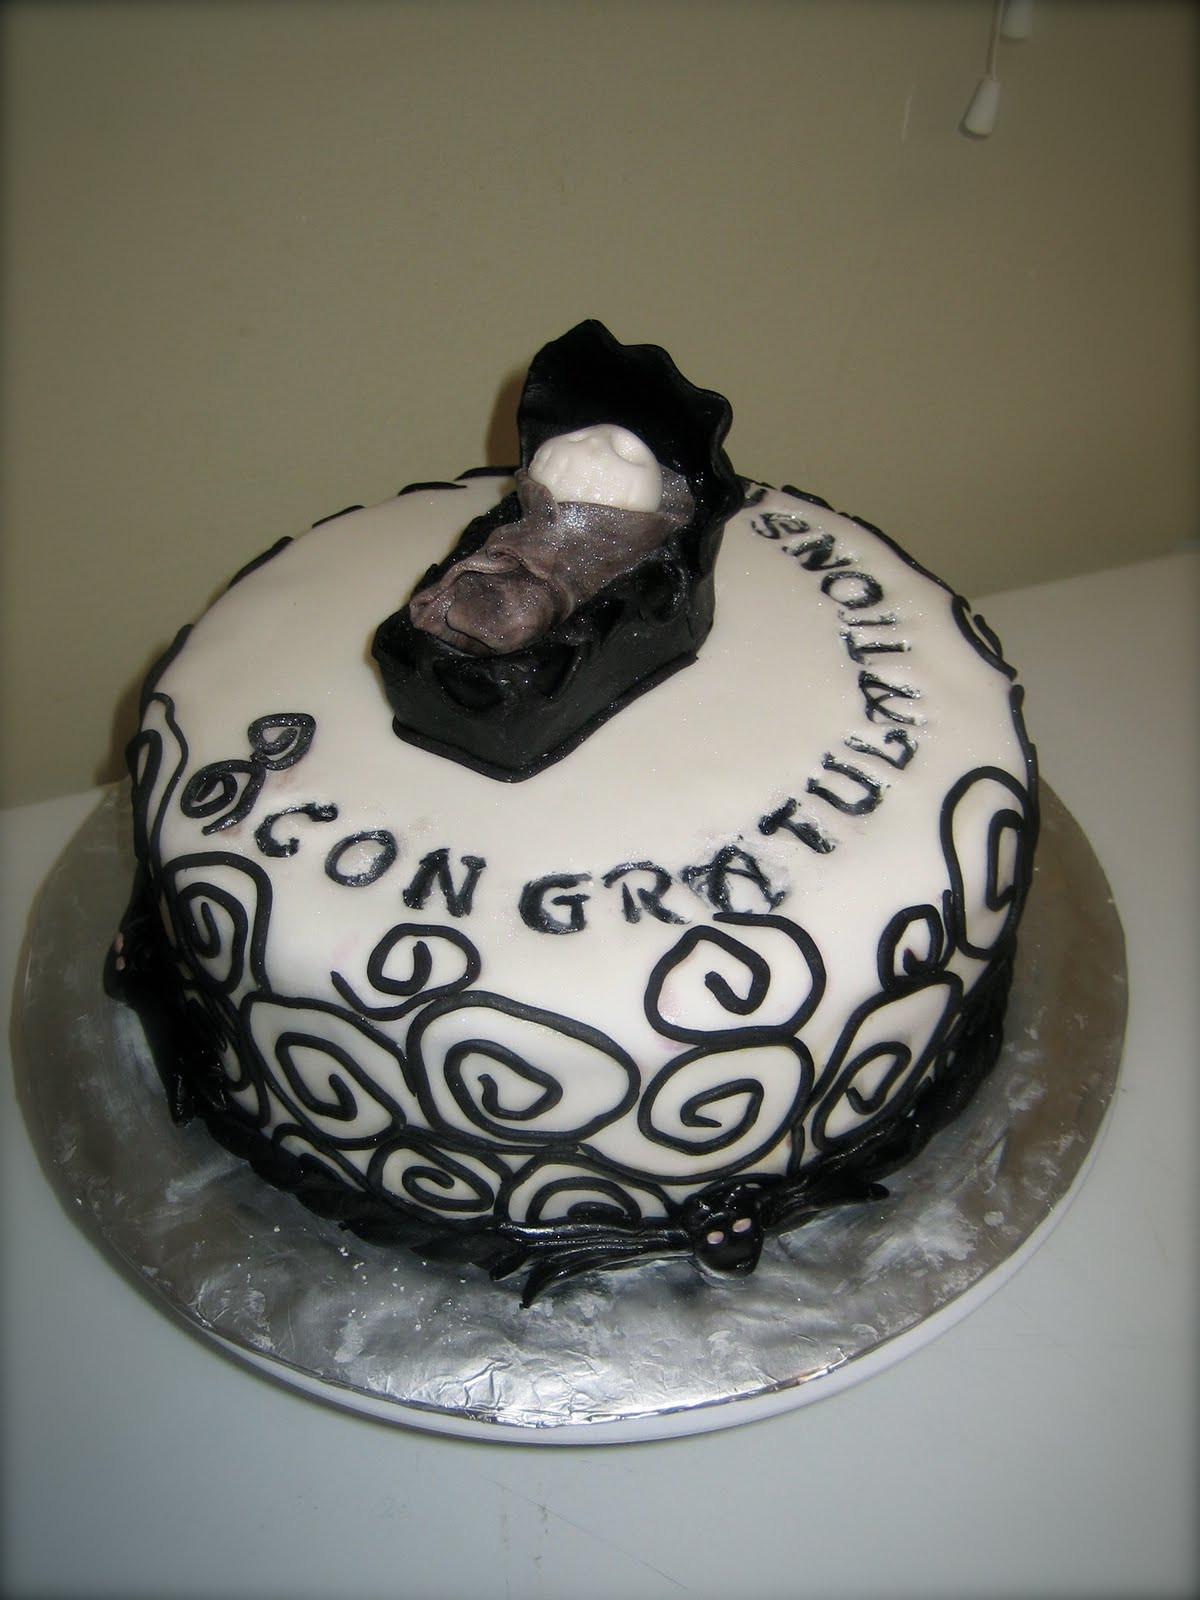 Nightmare Before Christmas Baby Shower Cakes  Sweet & Simple Custom Cake Design April 2011